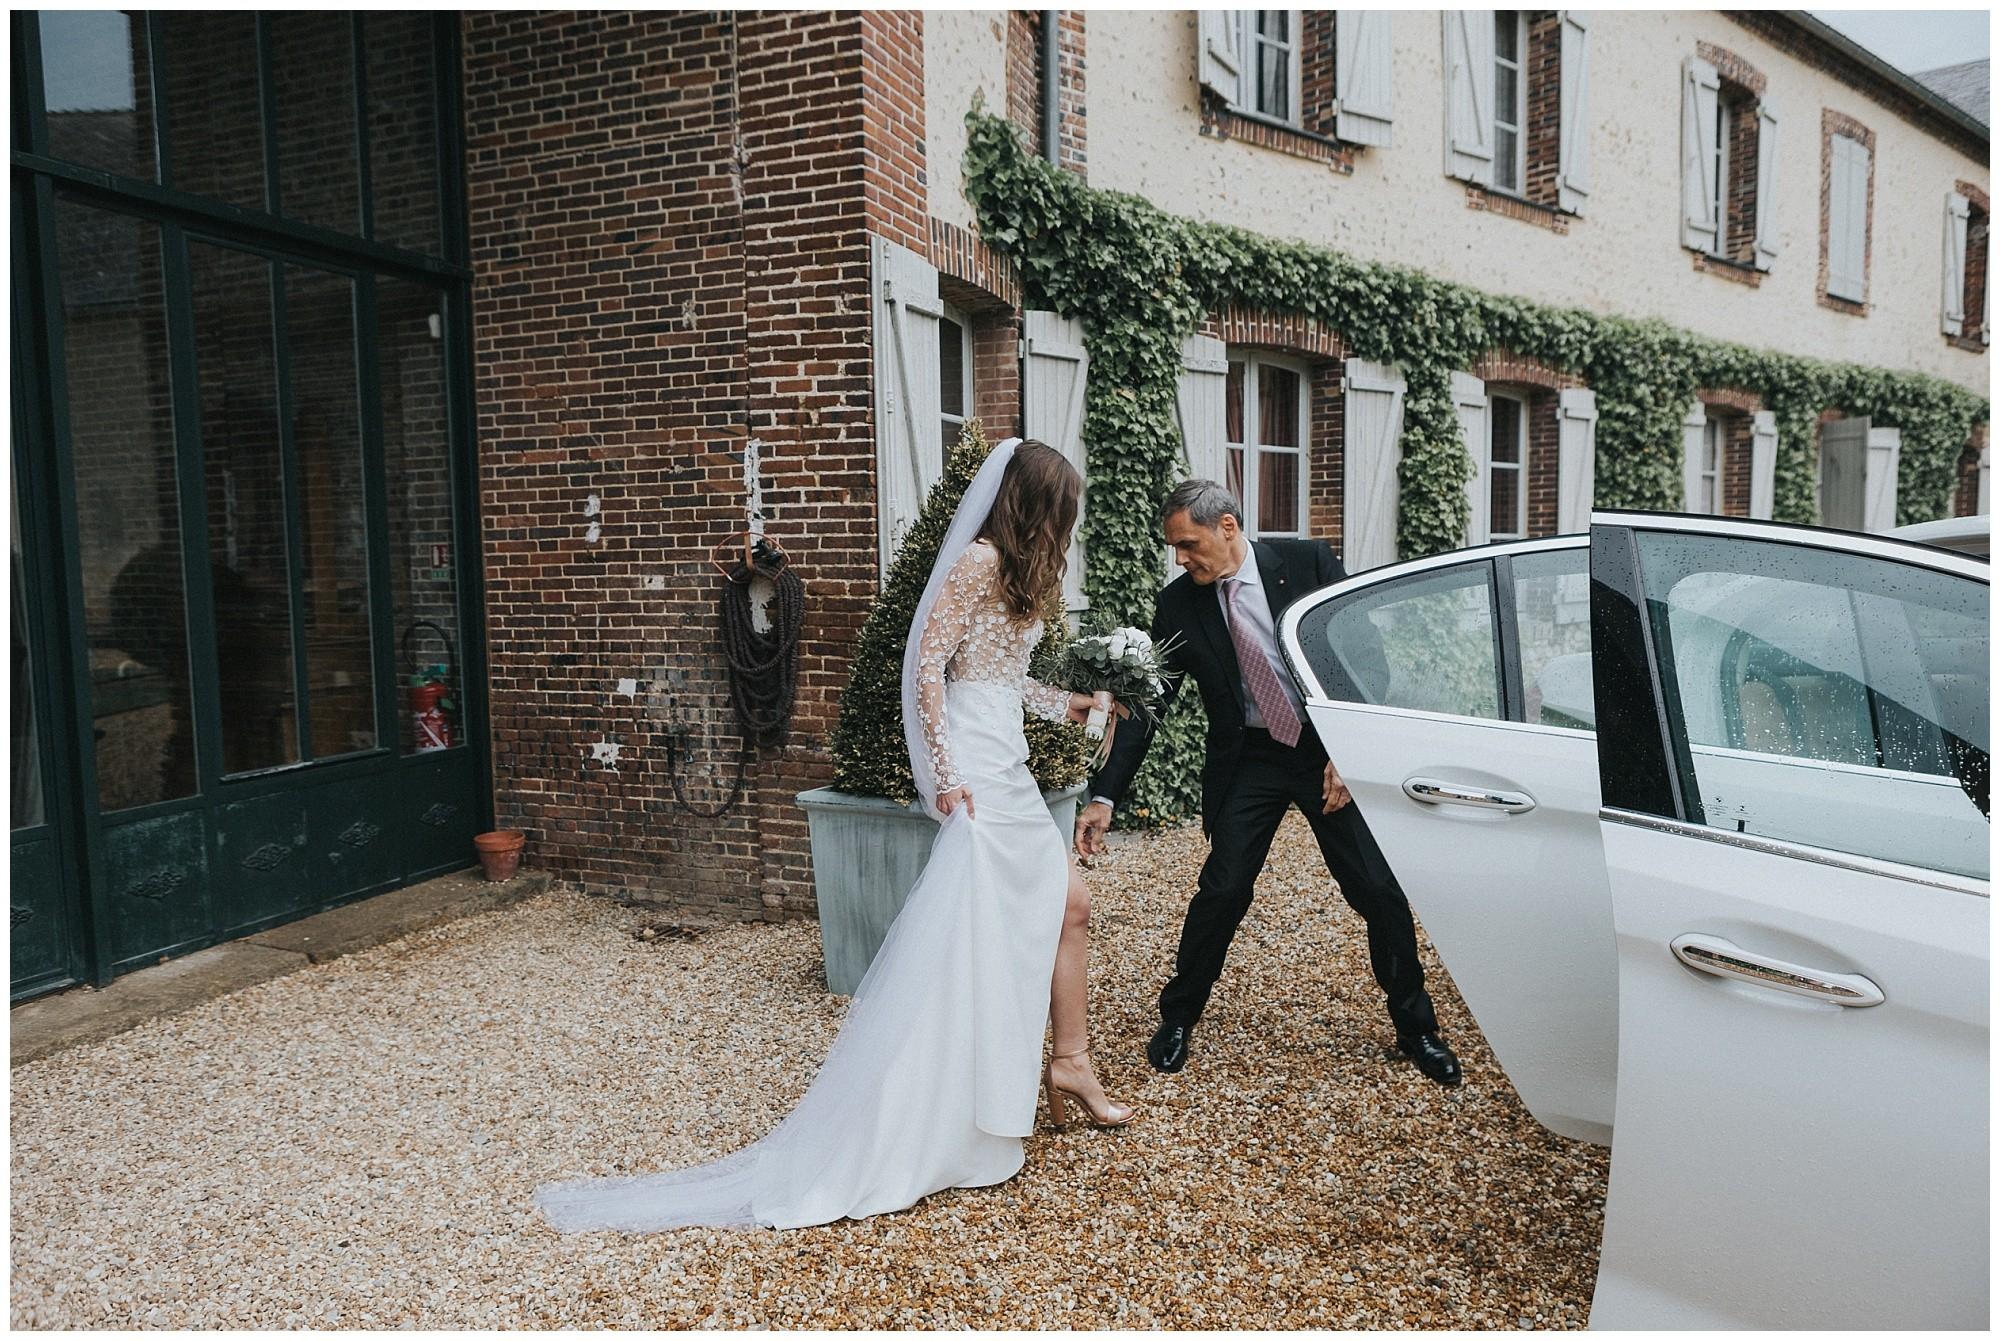 Kateryna-photos-photographer-reims-domaine-des-evis-mariage-normandie-rime-arodaky_0228.jpg